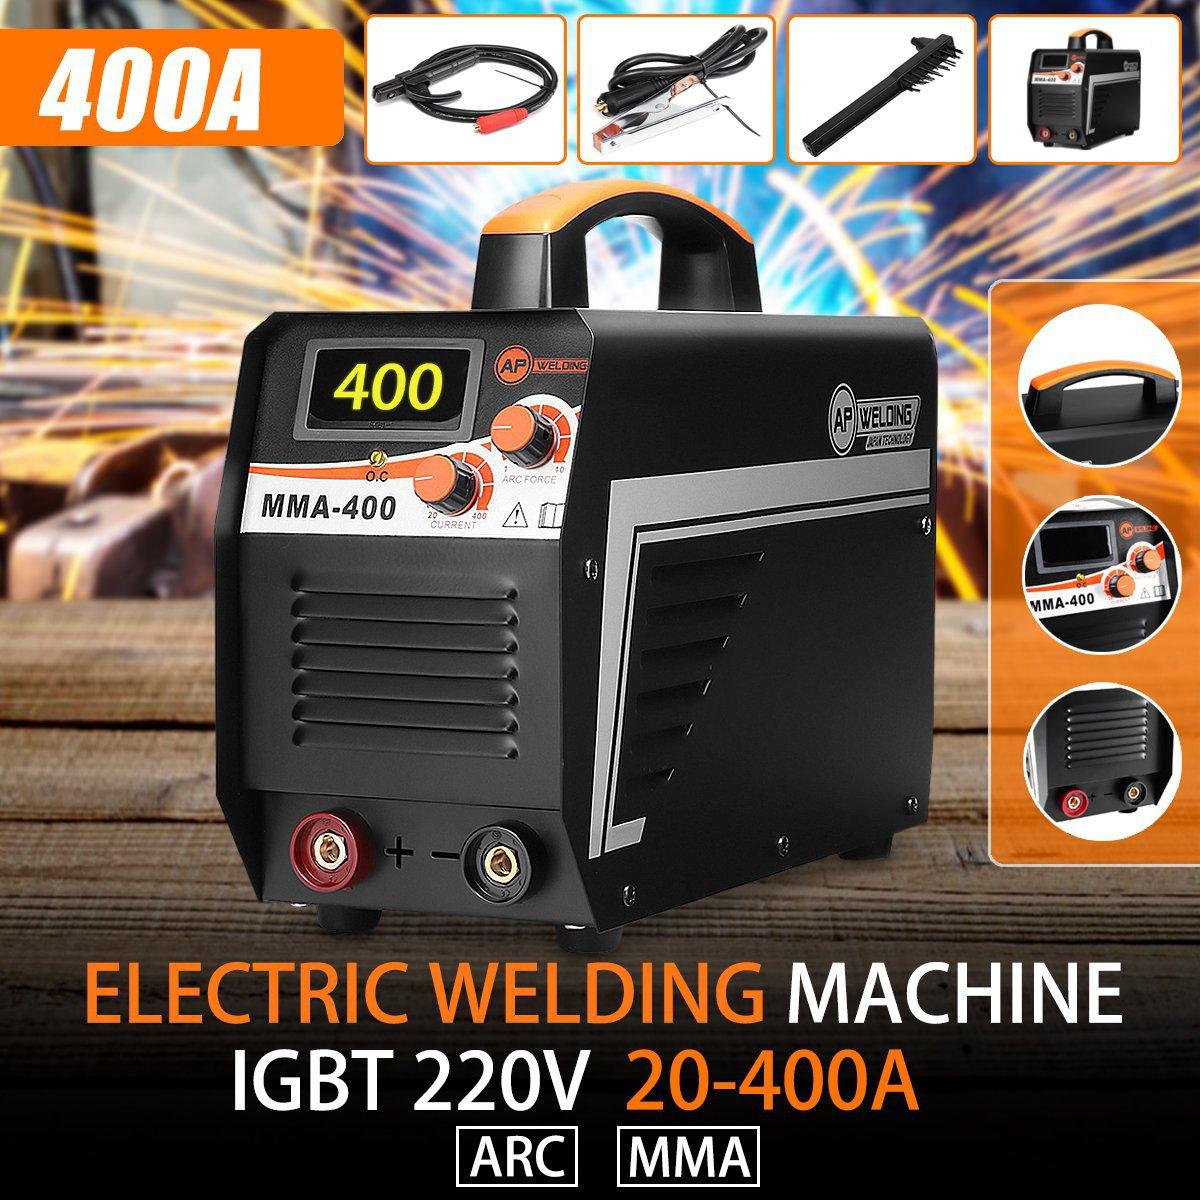 220V IGBT Inverter Arc Electric Welding Machine Digital Display MMA 400 Arc Stick Welders Set Home Welding Working Power Tools